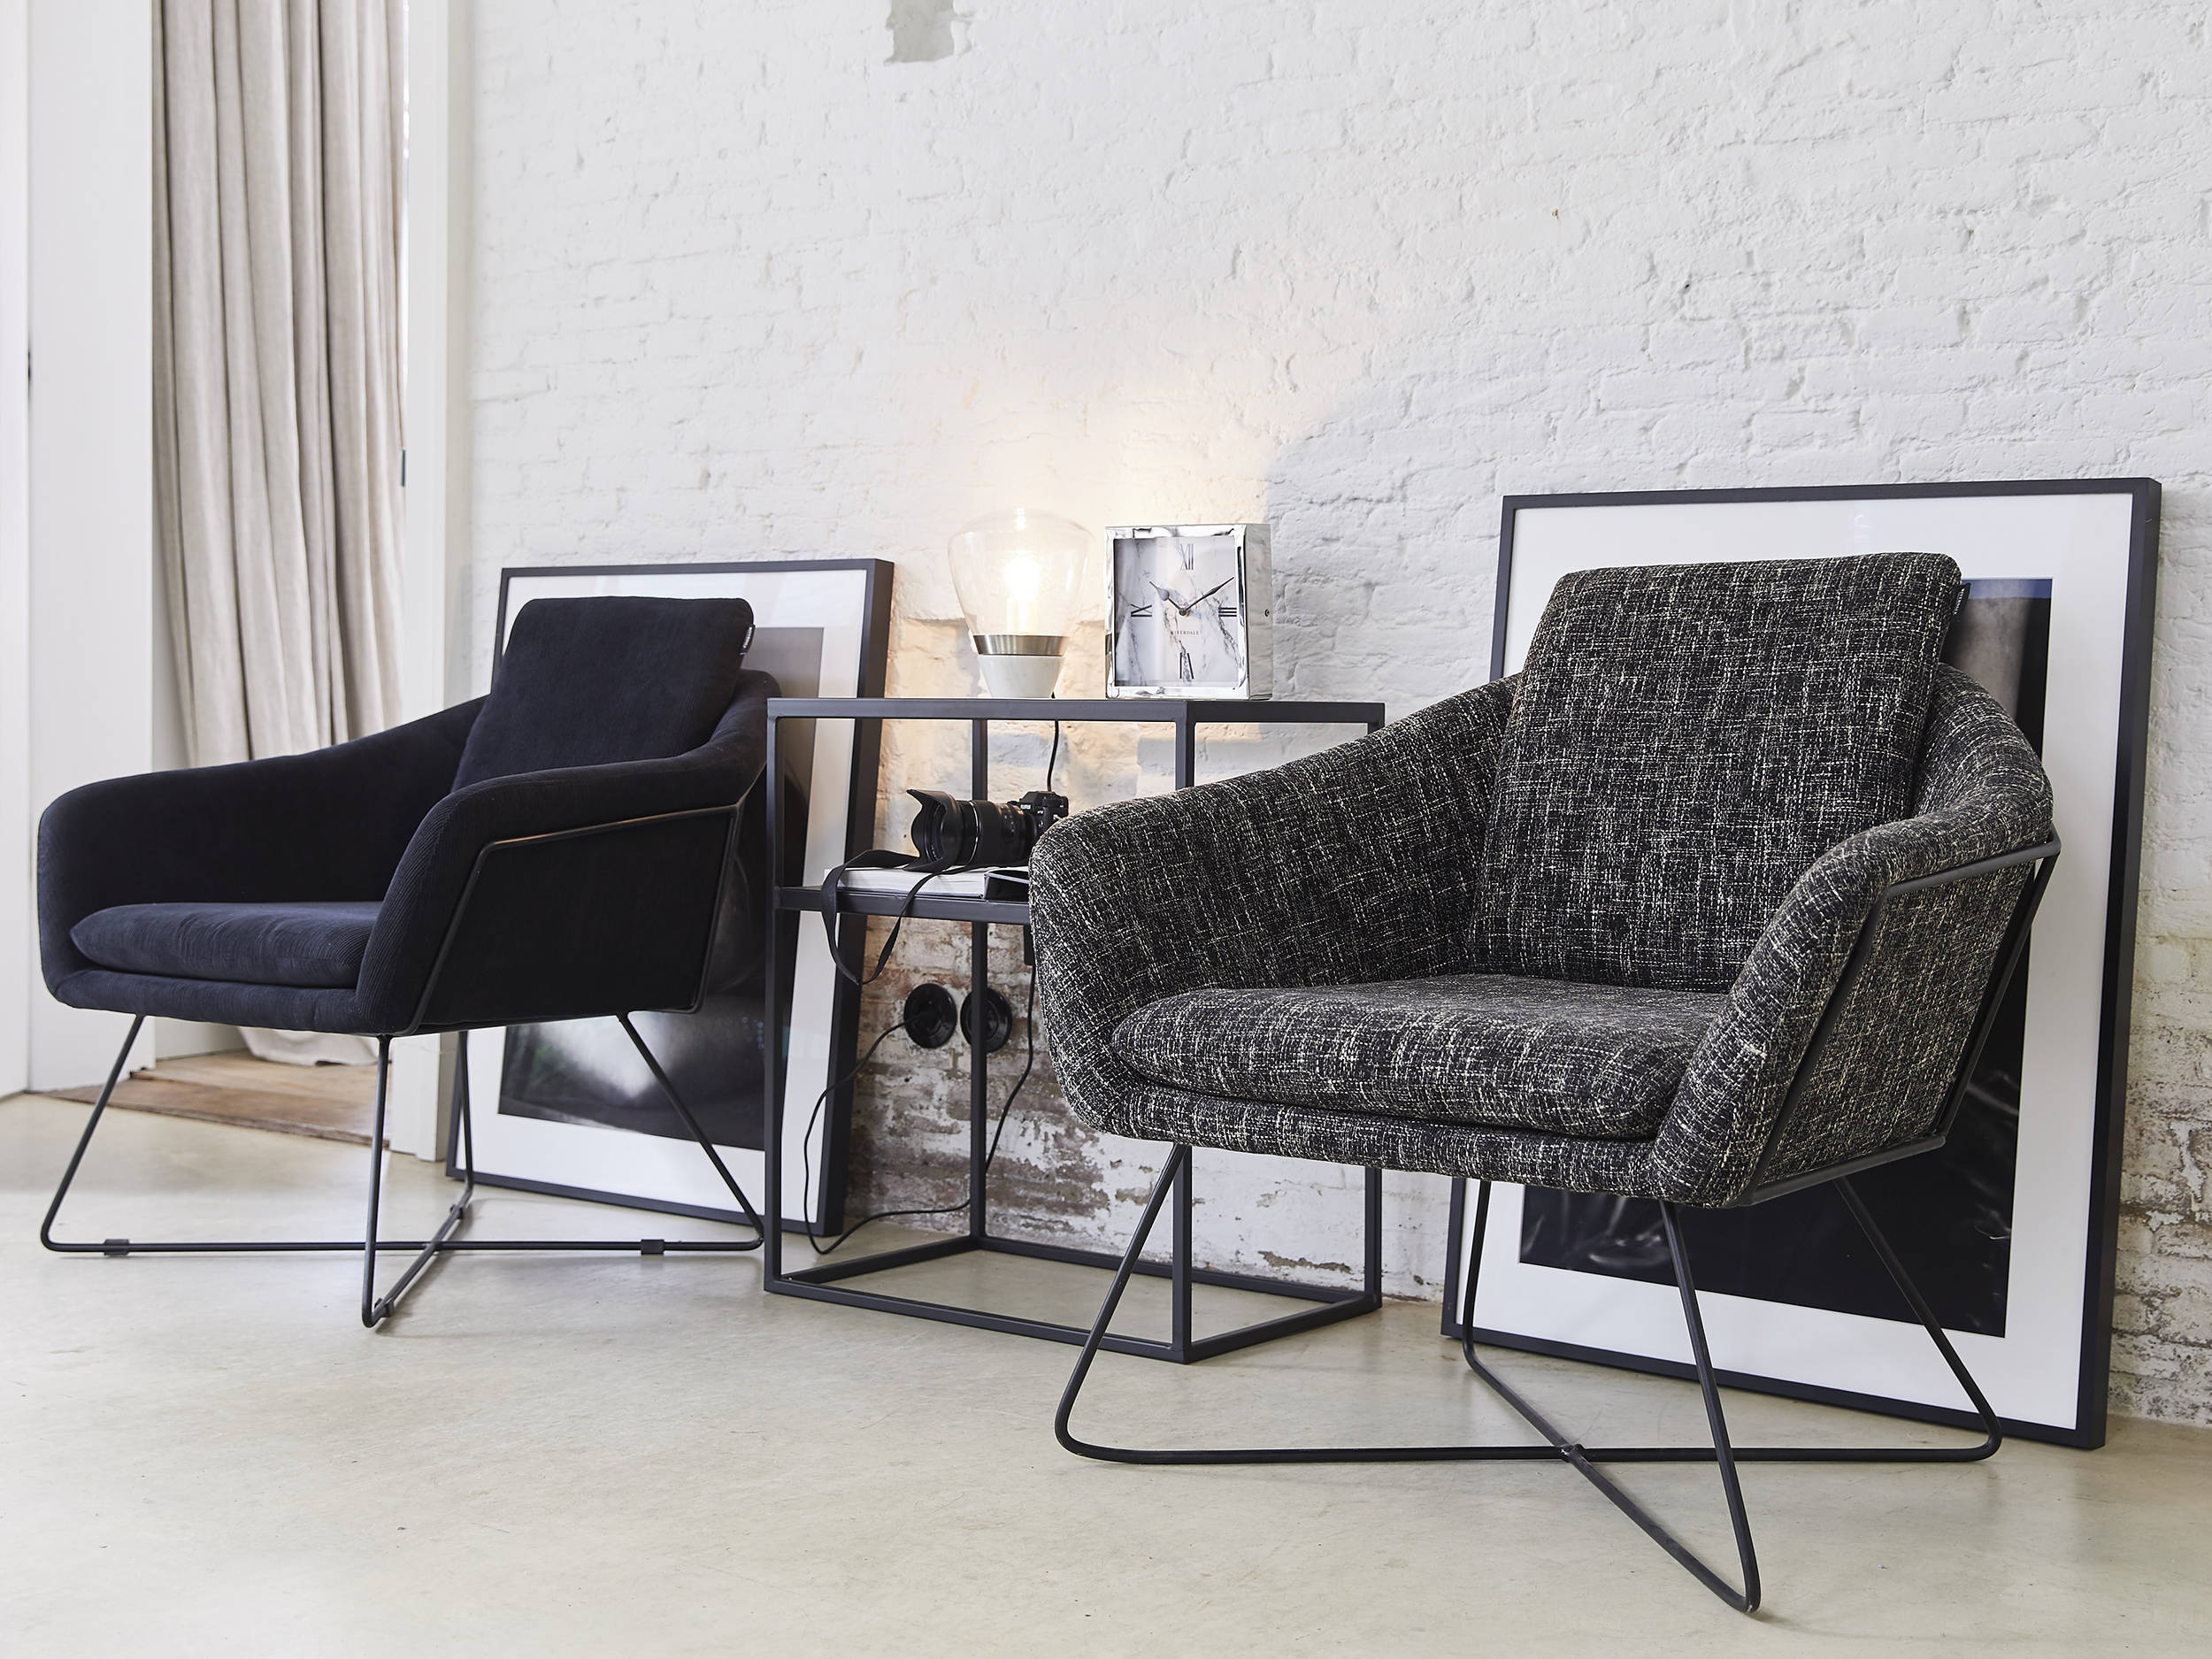 Riverdale meubelen